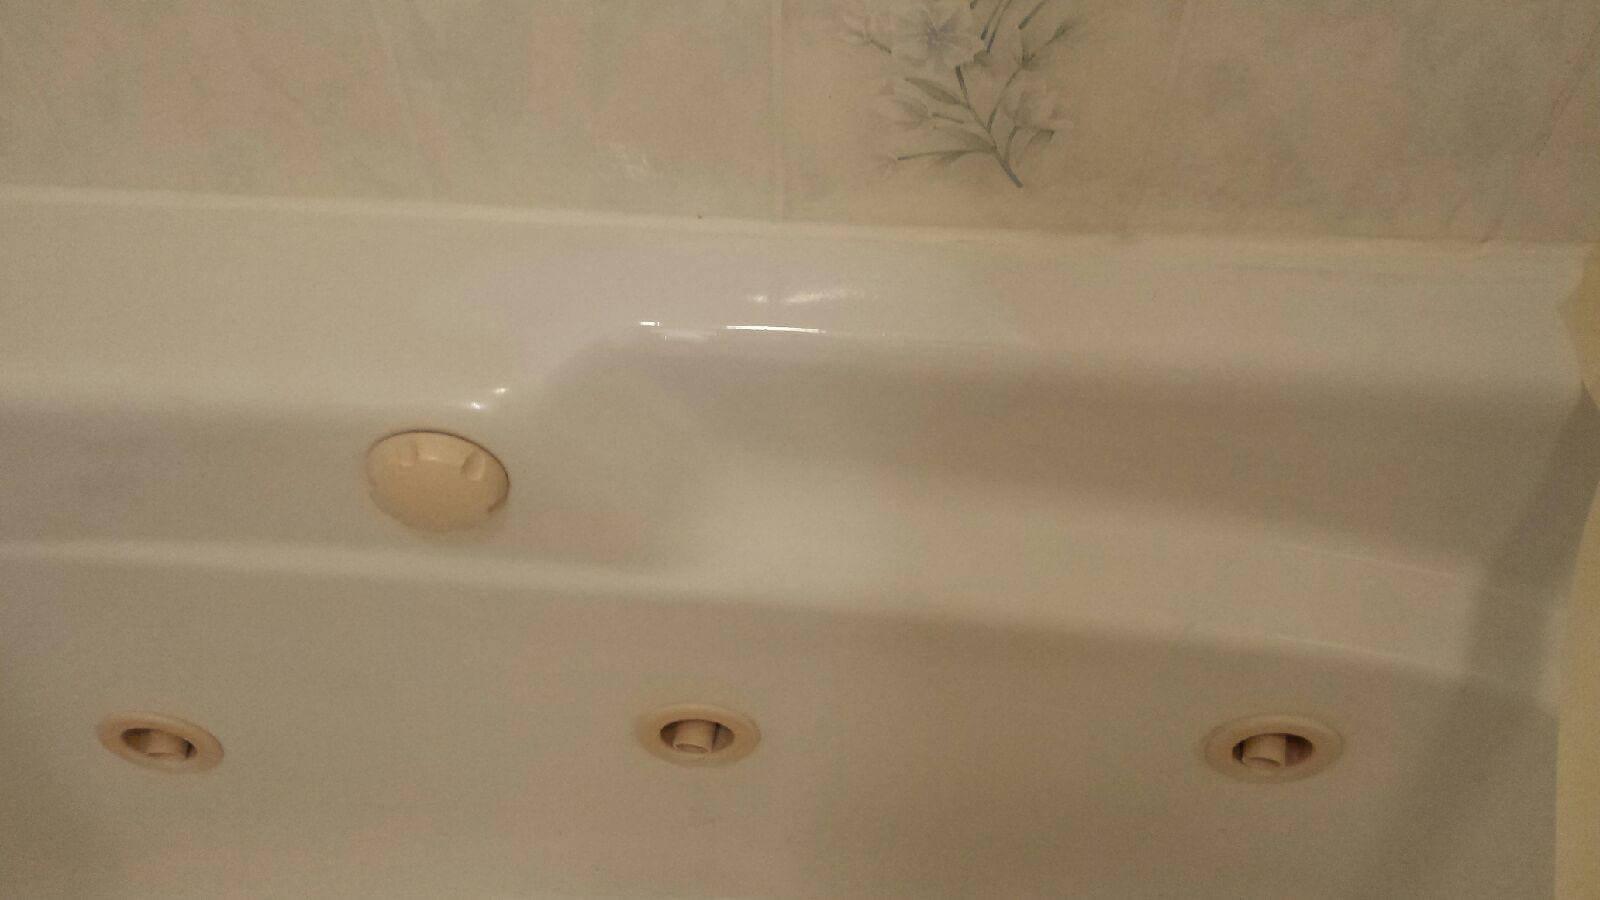 Large Chip in Acrylic Jacuzzi Repair - Bathtub Refinishing | Ohio ...